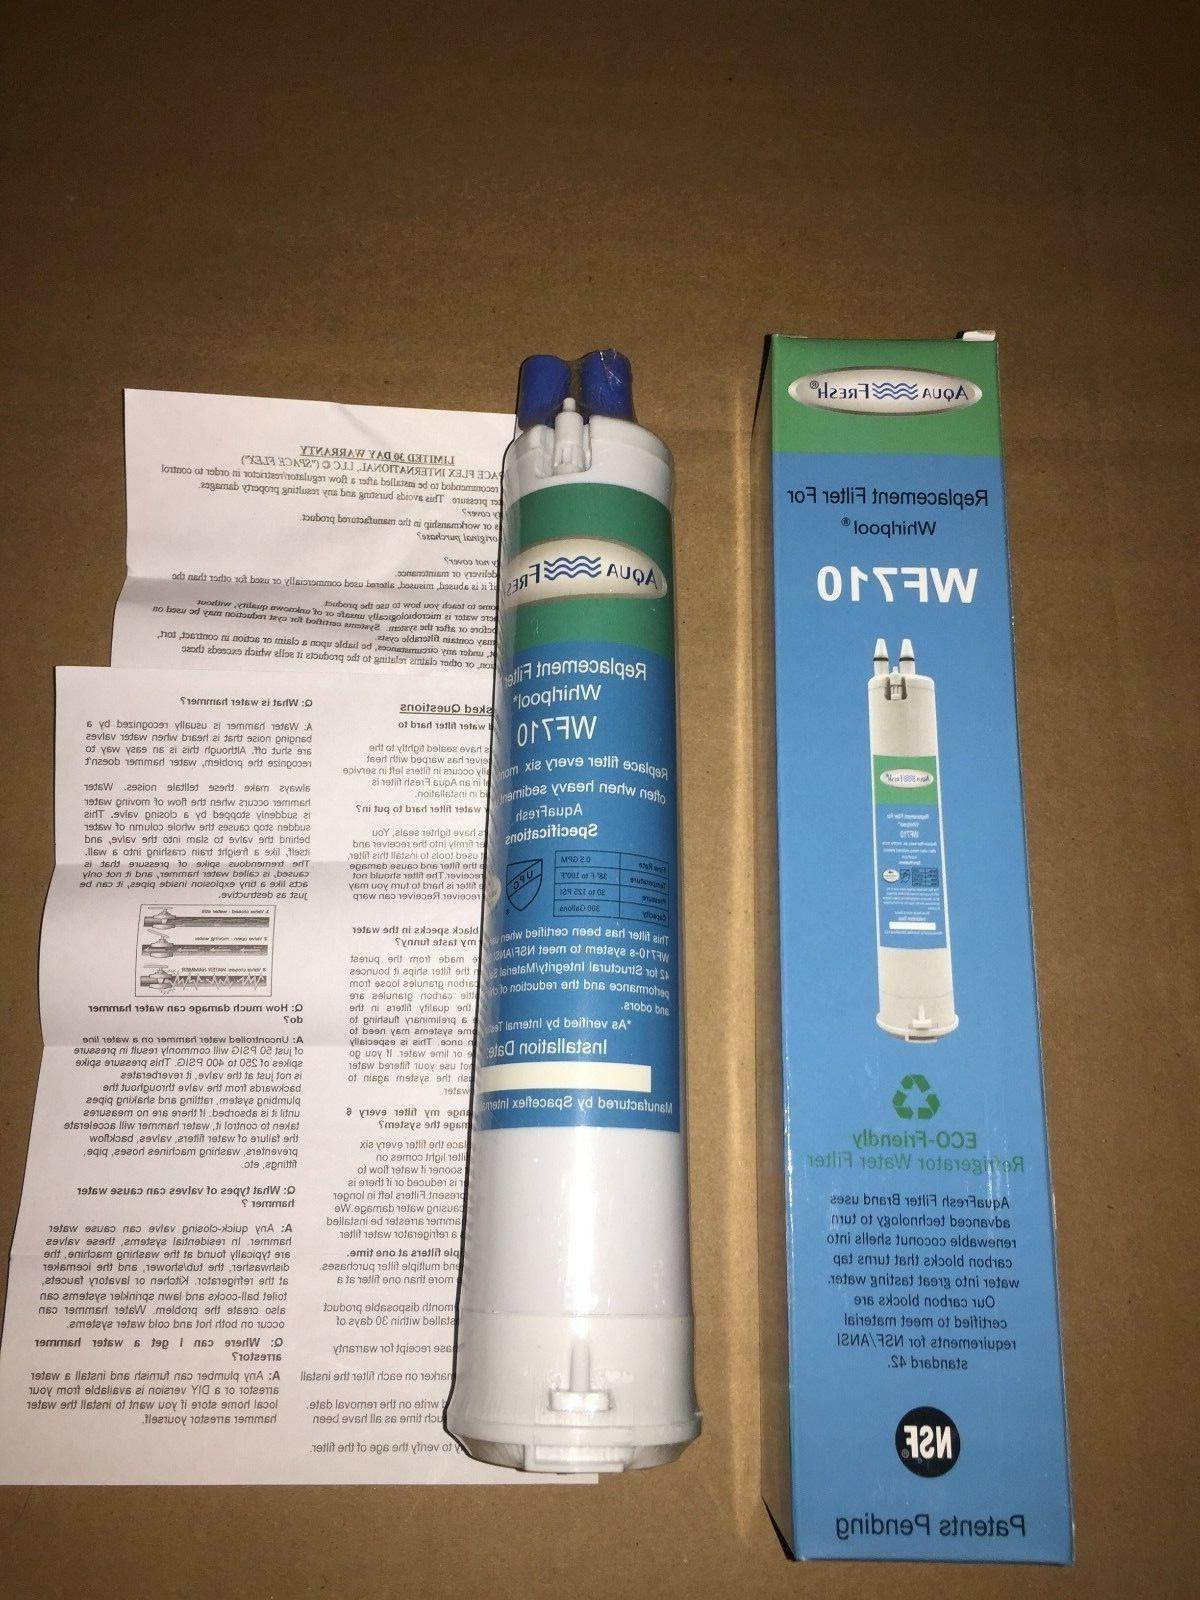 aquafresh wf710 whirlpool replacement refrigerator water fil